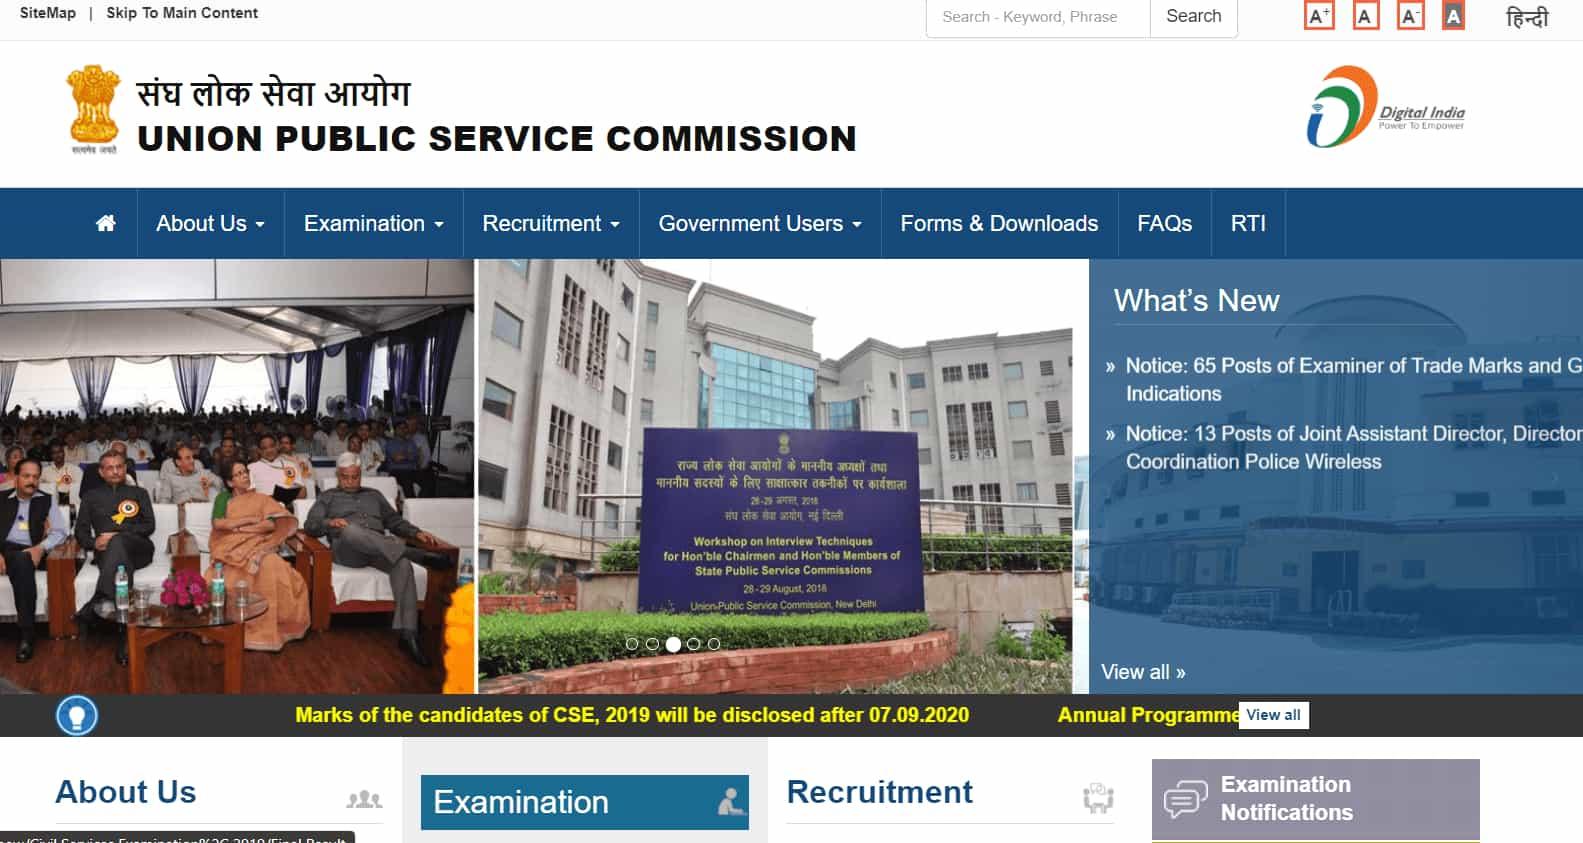 UPSC Combined Geo Scientist Mains Exam 2020